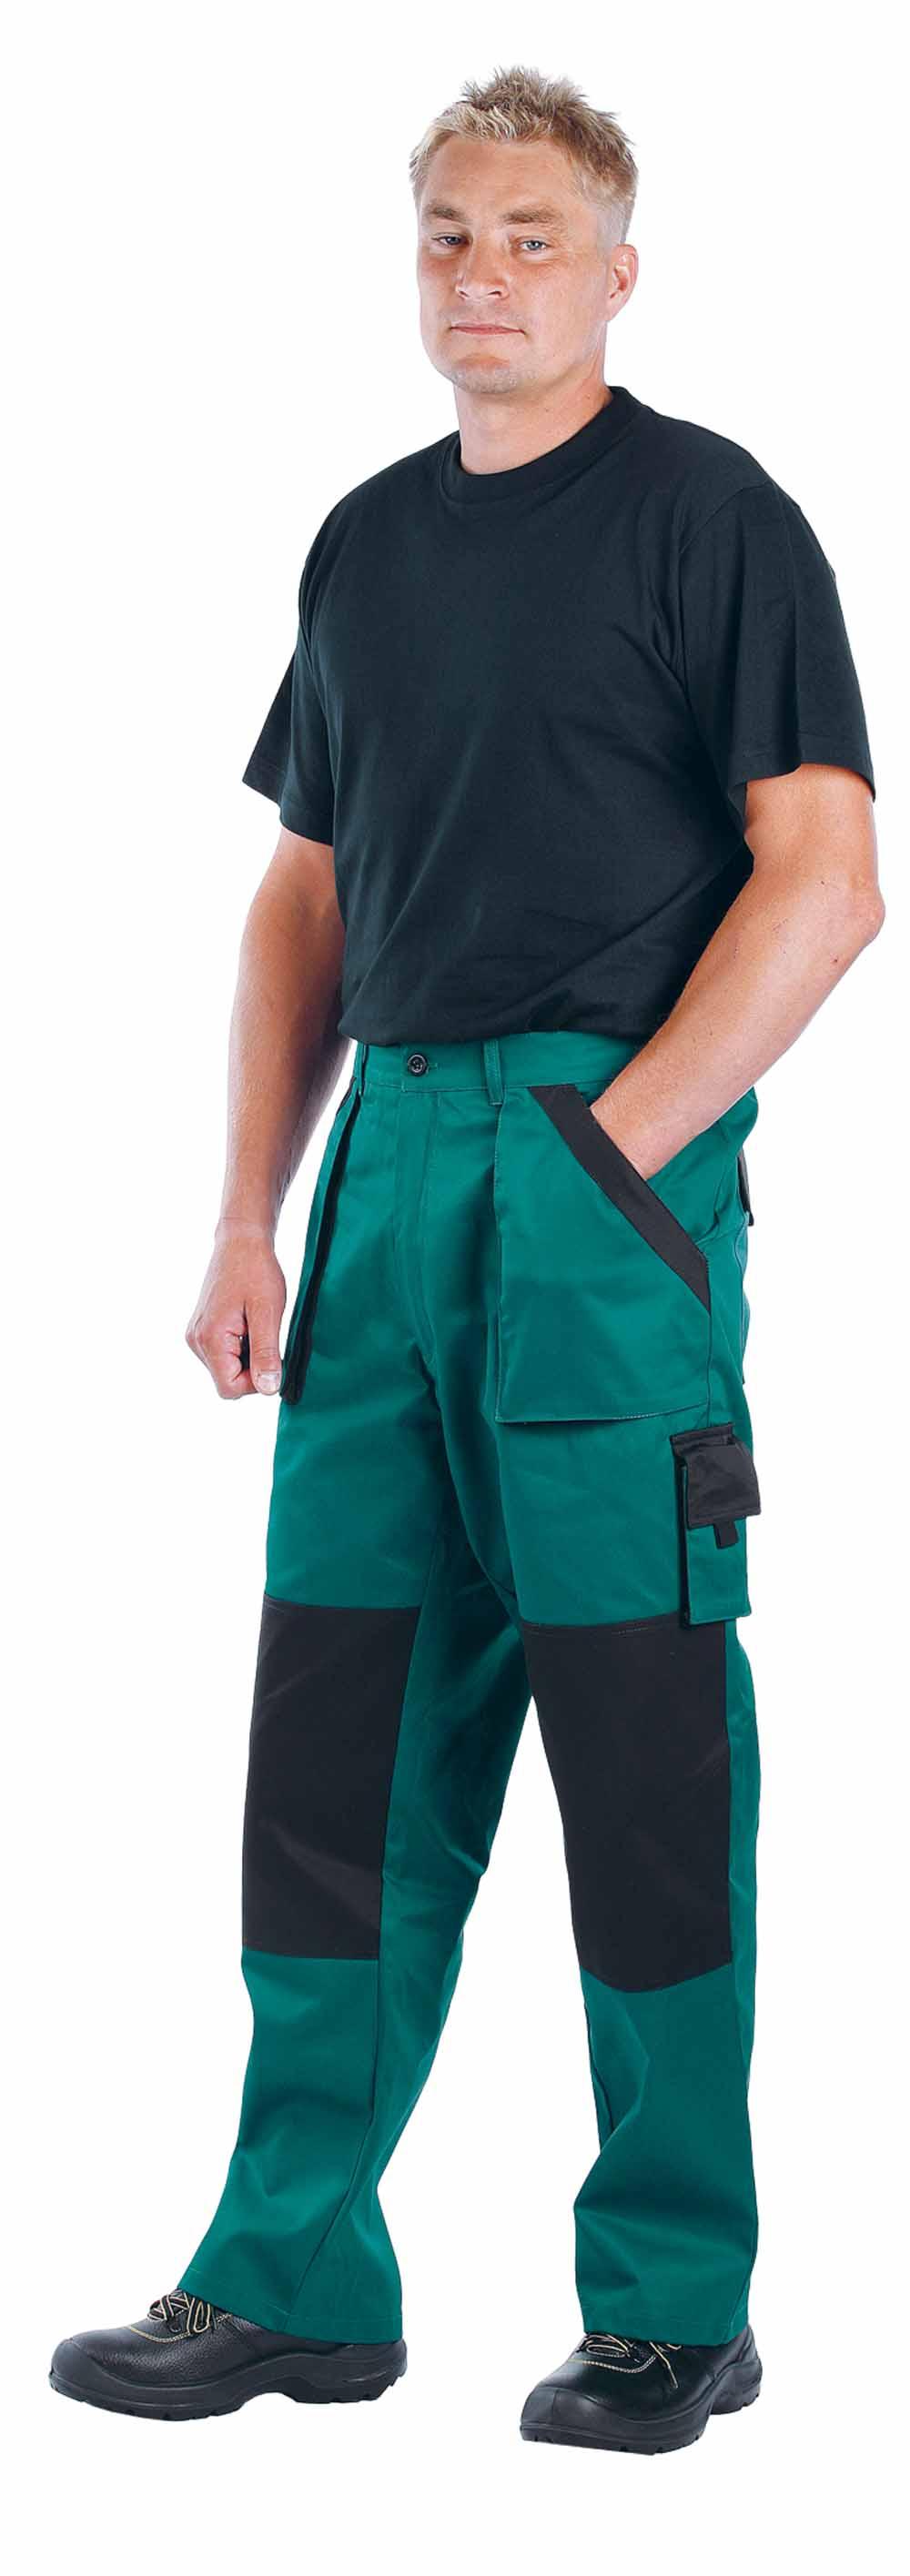 MAX nadrág zöld-fekete